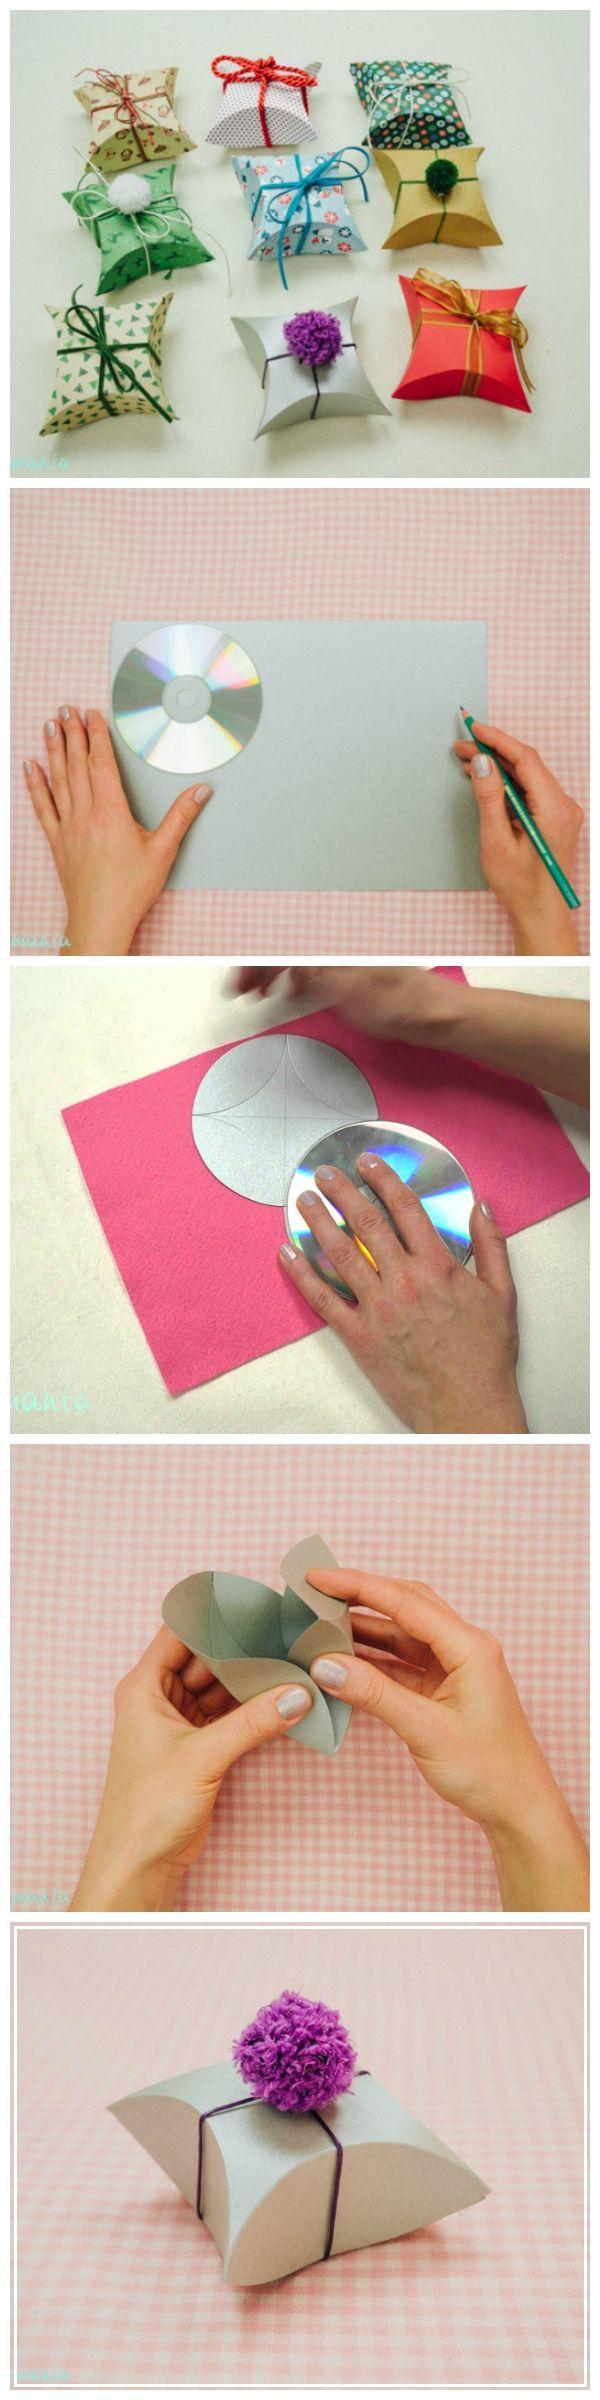 How To Make A Cigarette Box Cake